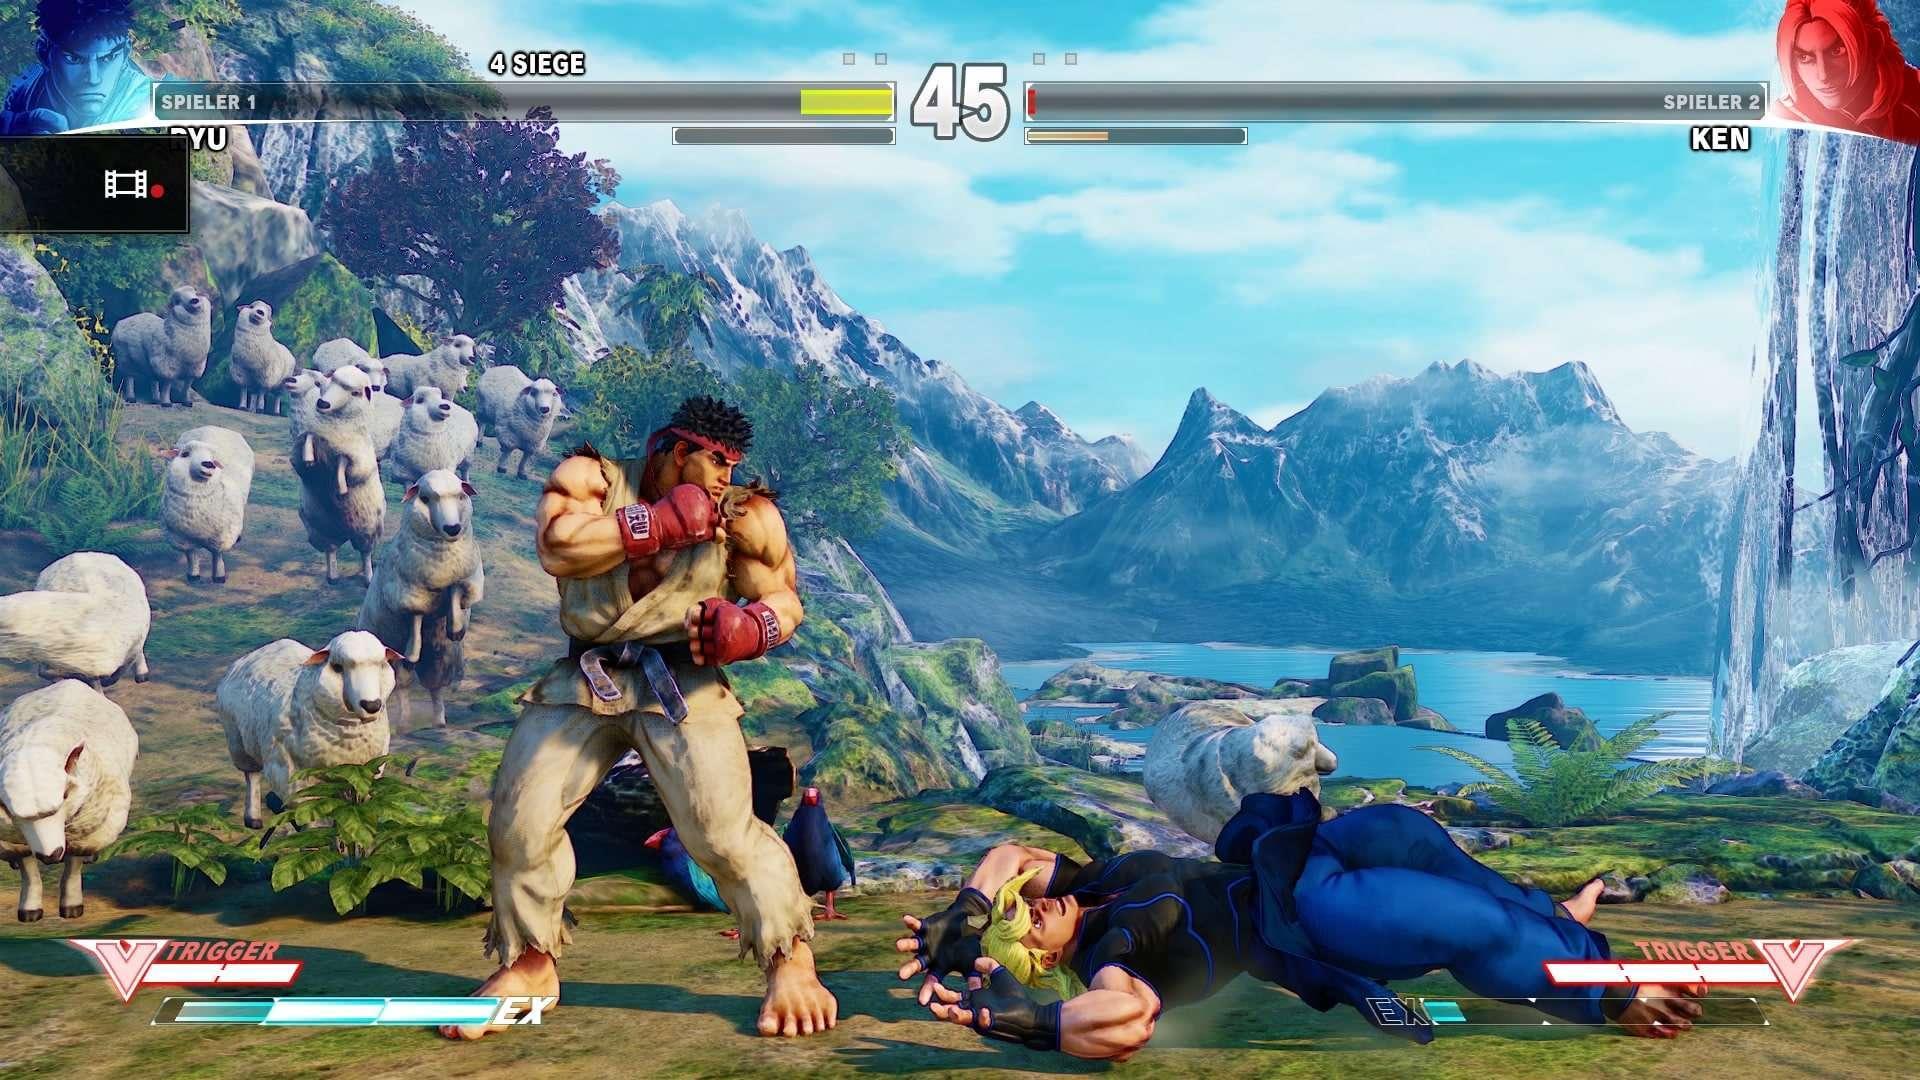 Hadoken strikes again – Street Fighter V (PS4) kurz angespielt 8 techboys.de • smarte News, auf den Punkt! Hadoken strikes again – Street Fighter V (PS4) kurz angespielt